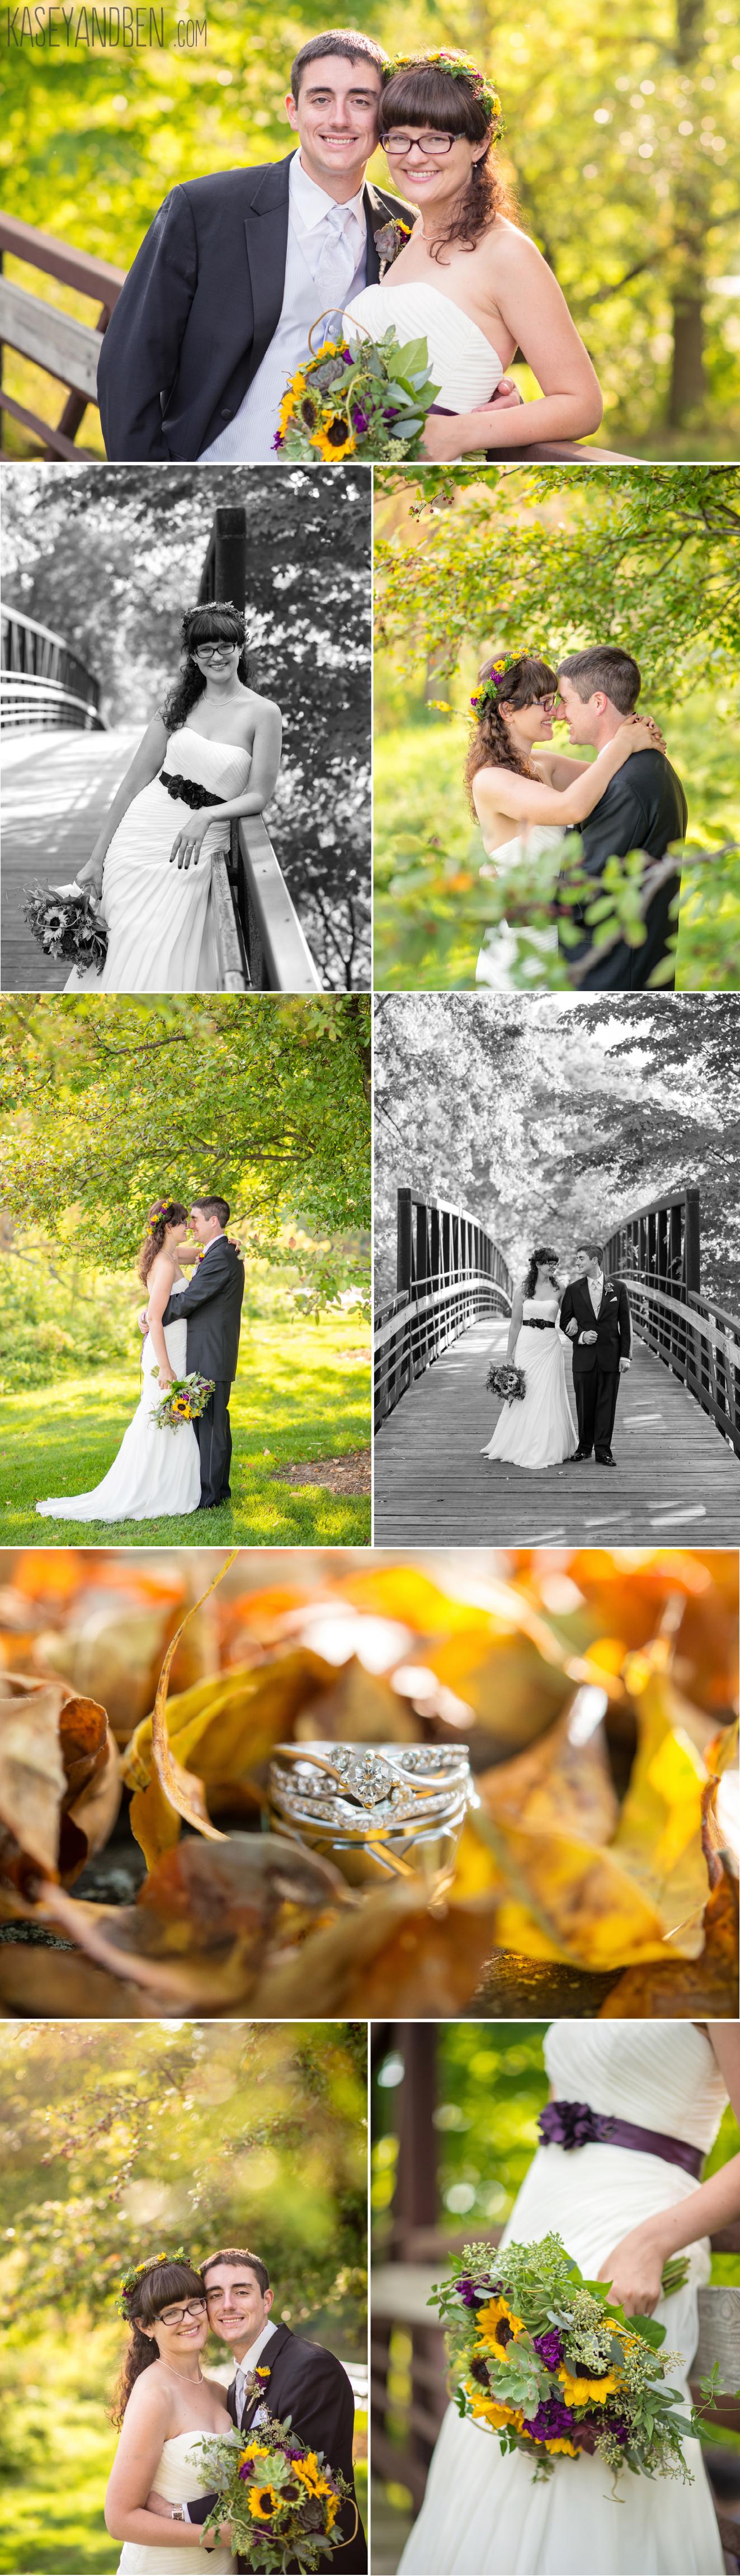 Green-Bay-Wedding-Photographer-Fall-Autumn-September-Resurrection-Church-Green-Isle-Park2